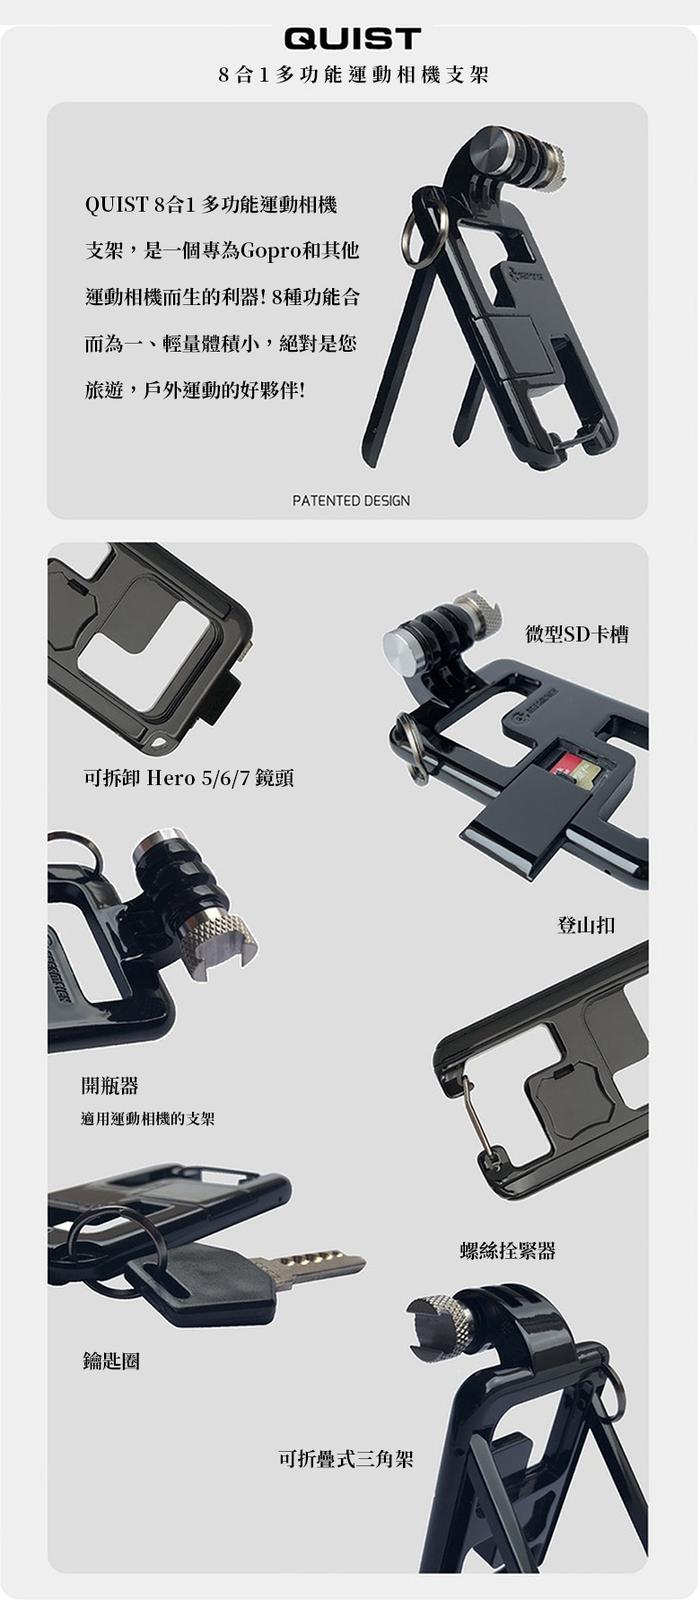 Dreampick|QUIST 8合1 多功能運動相機支架